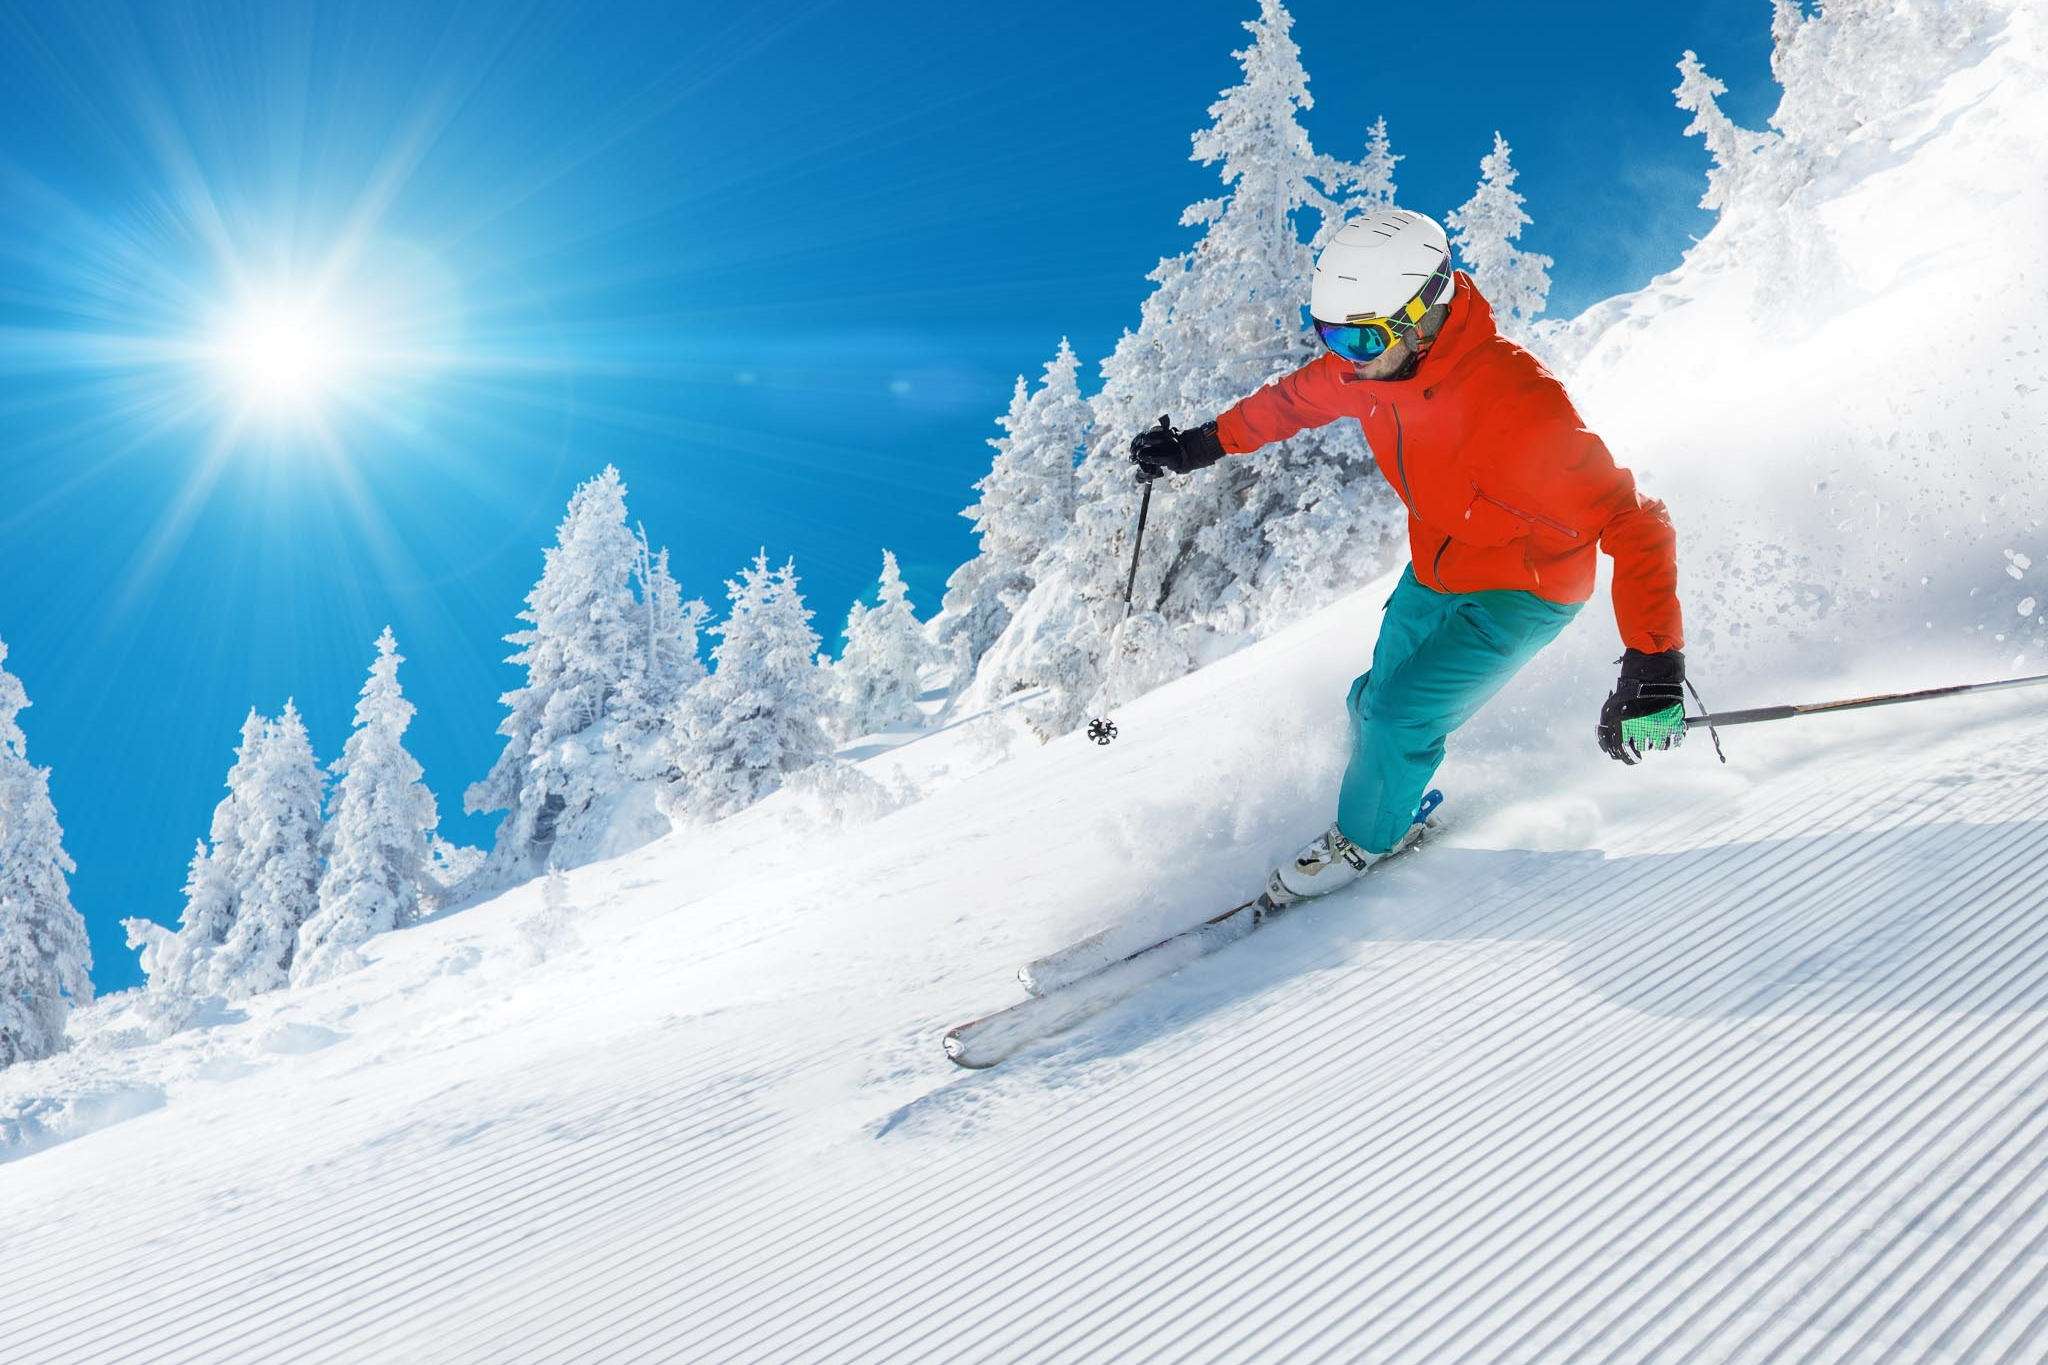 skirentals/snowboardrentals.jpg